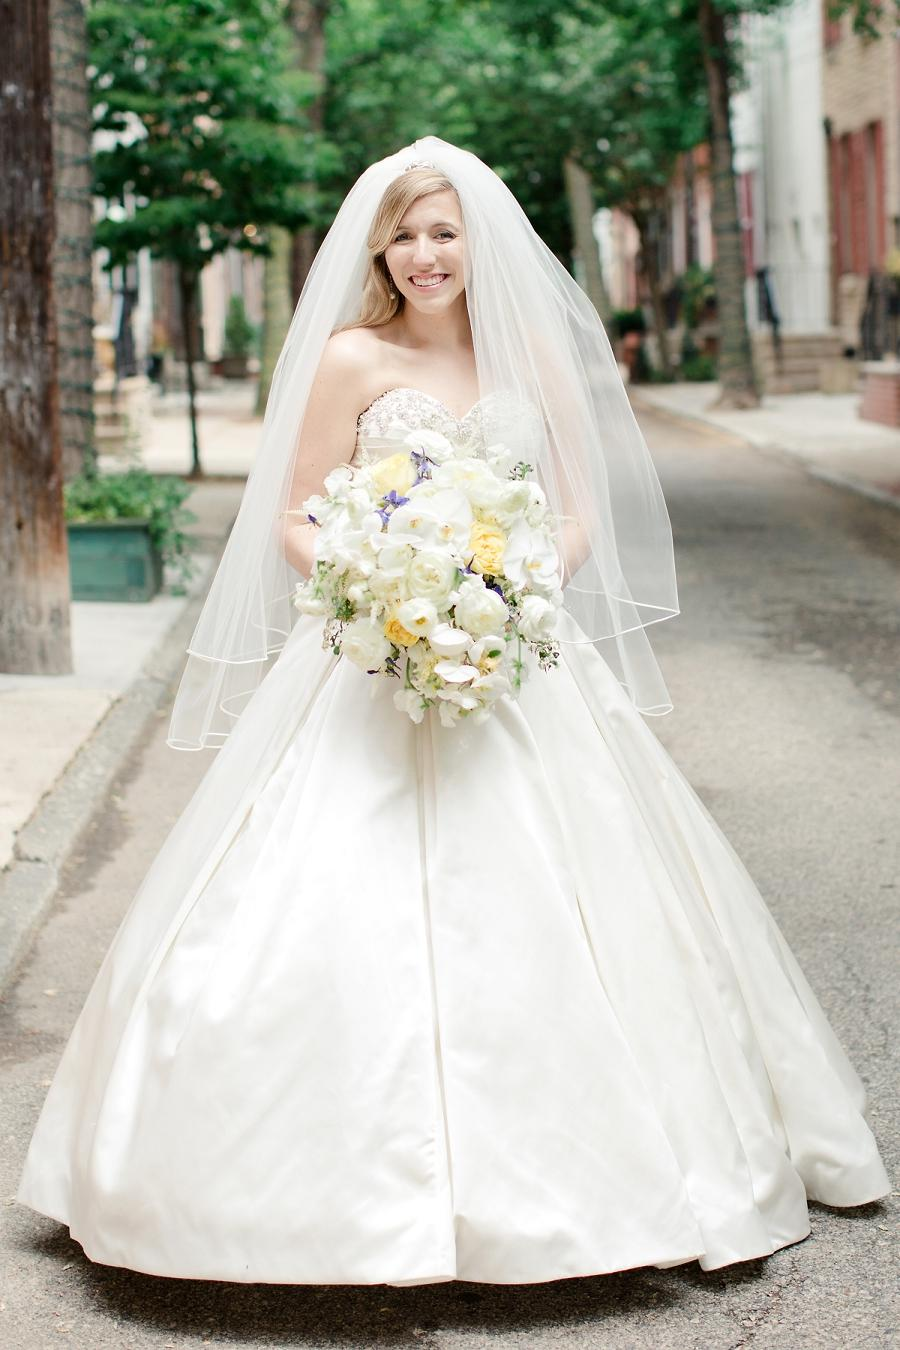 Pyramid-Club-Philadelphia-Wedding-by-Adrienne-Matz-Photography_0042